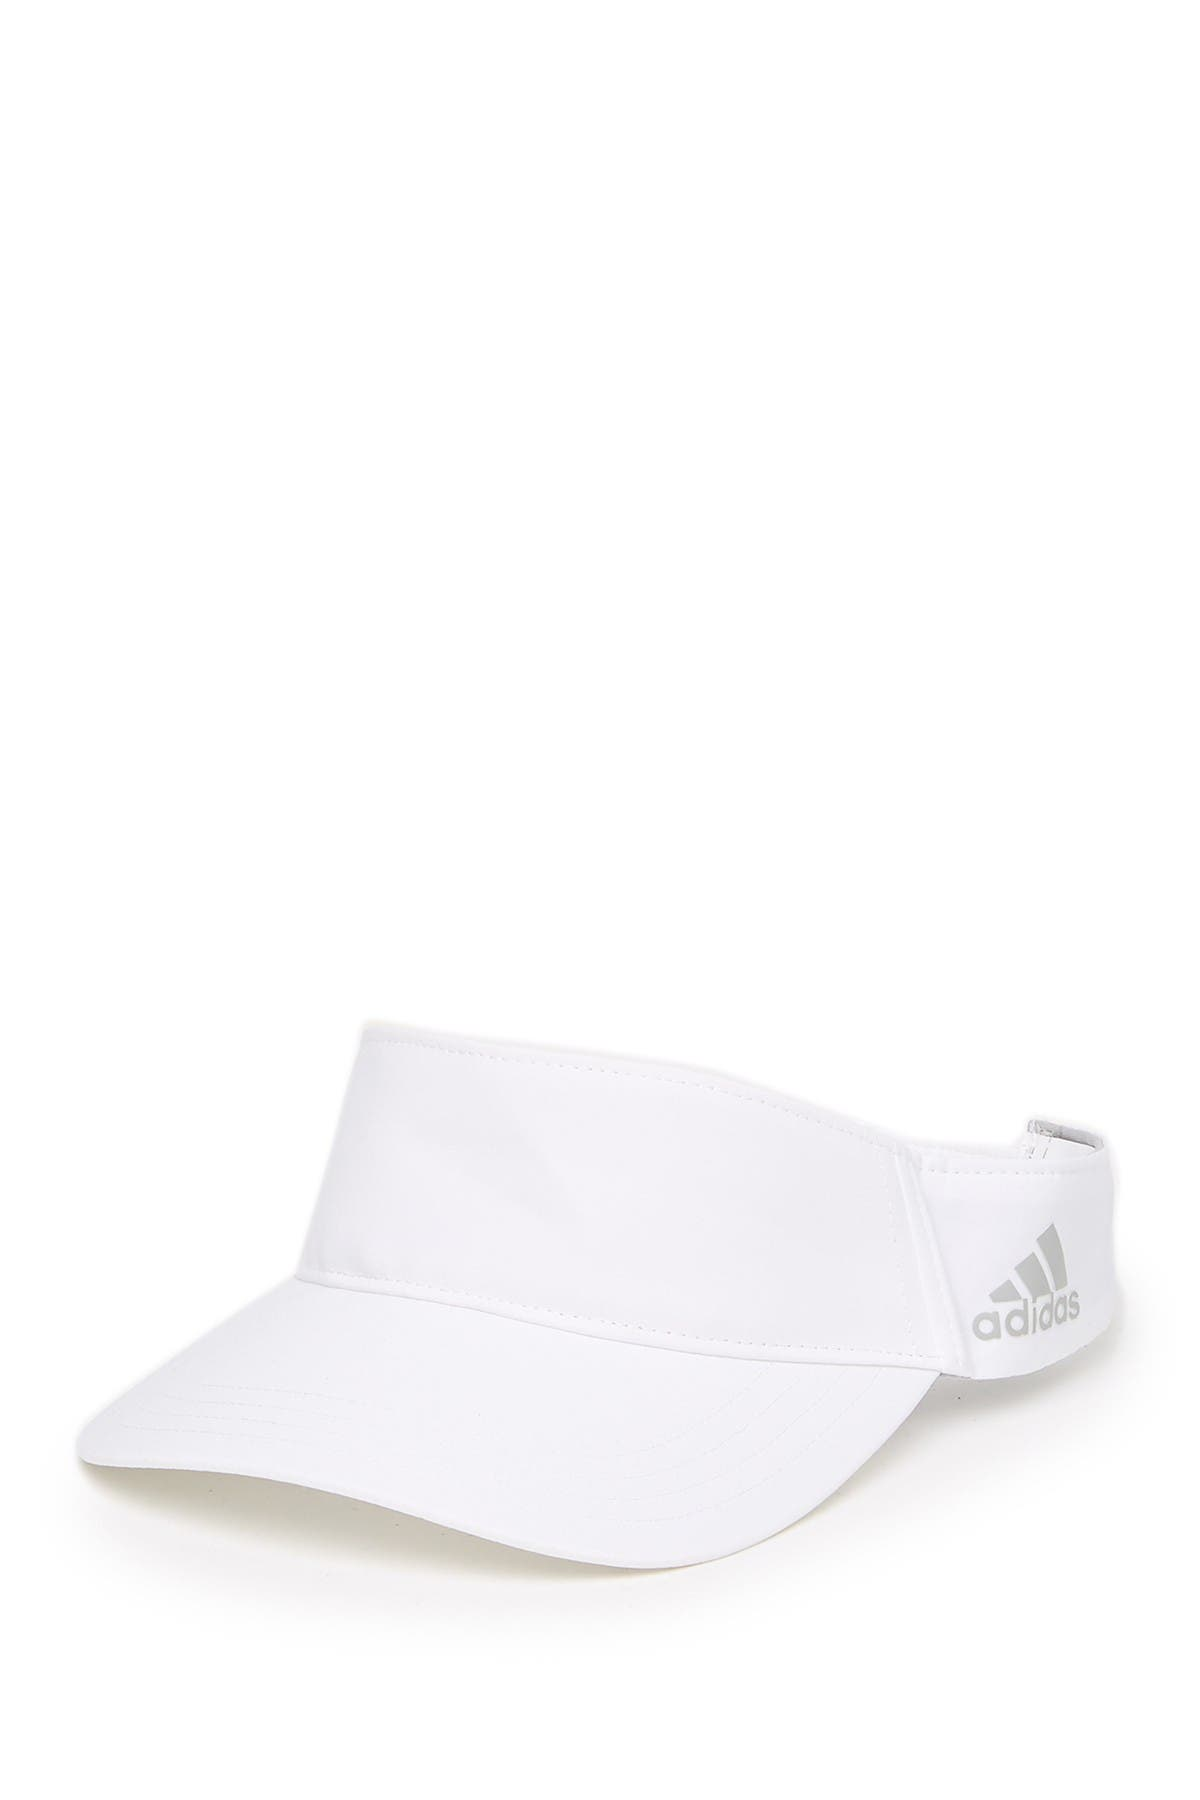 Image of Adidas Golf Crestable Heathered Visor